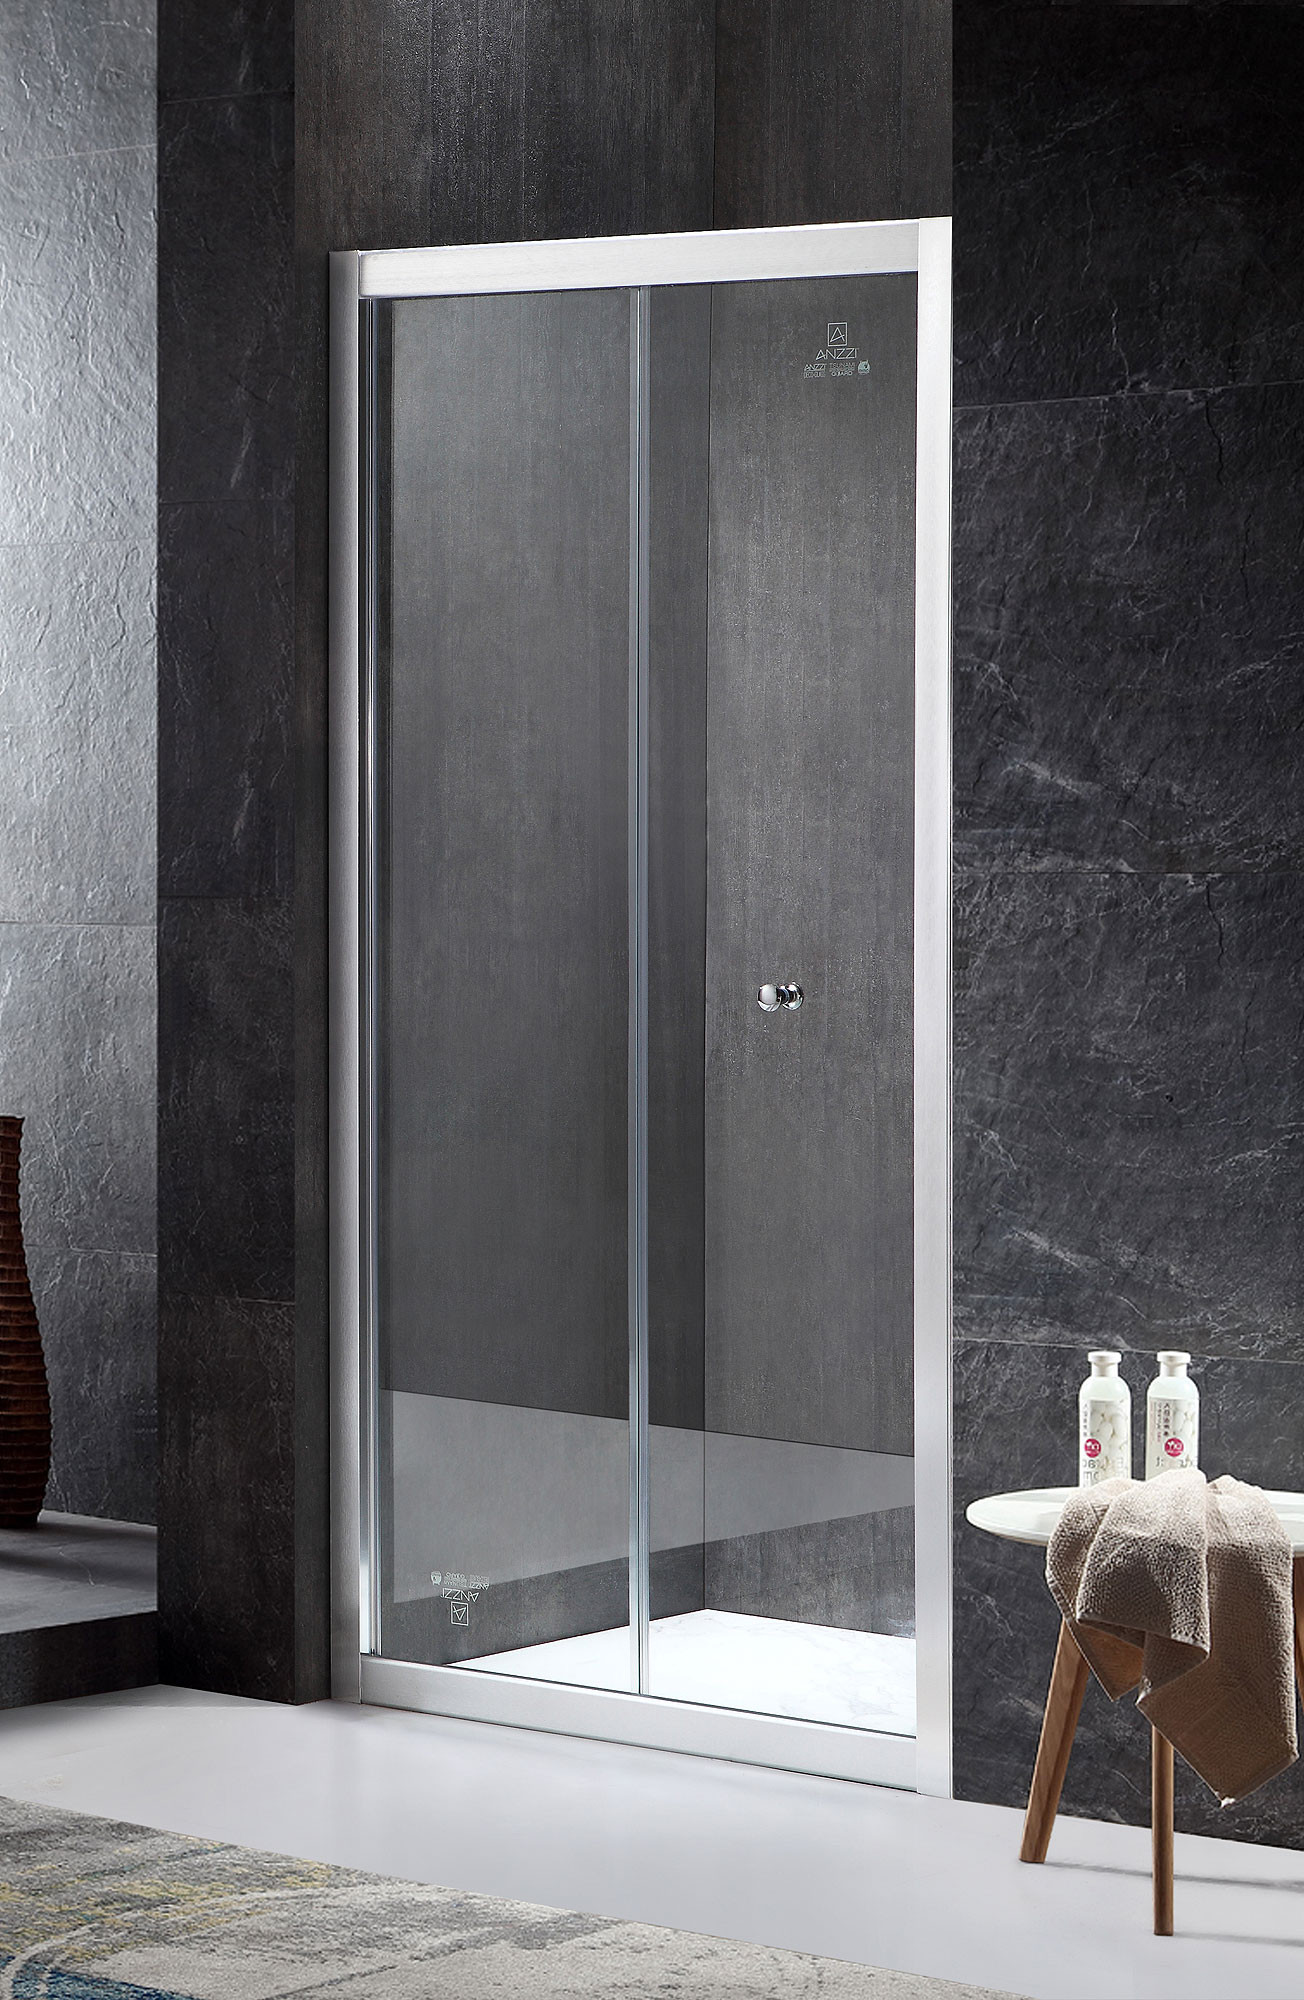 ANZZI SD-AZ40BN Brushed Nickel Rampart Series Hinged Bi-Fold Shower Door